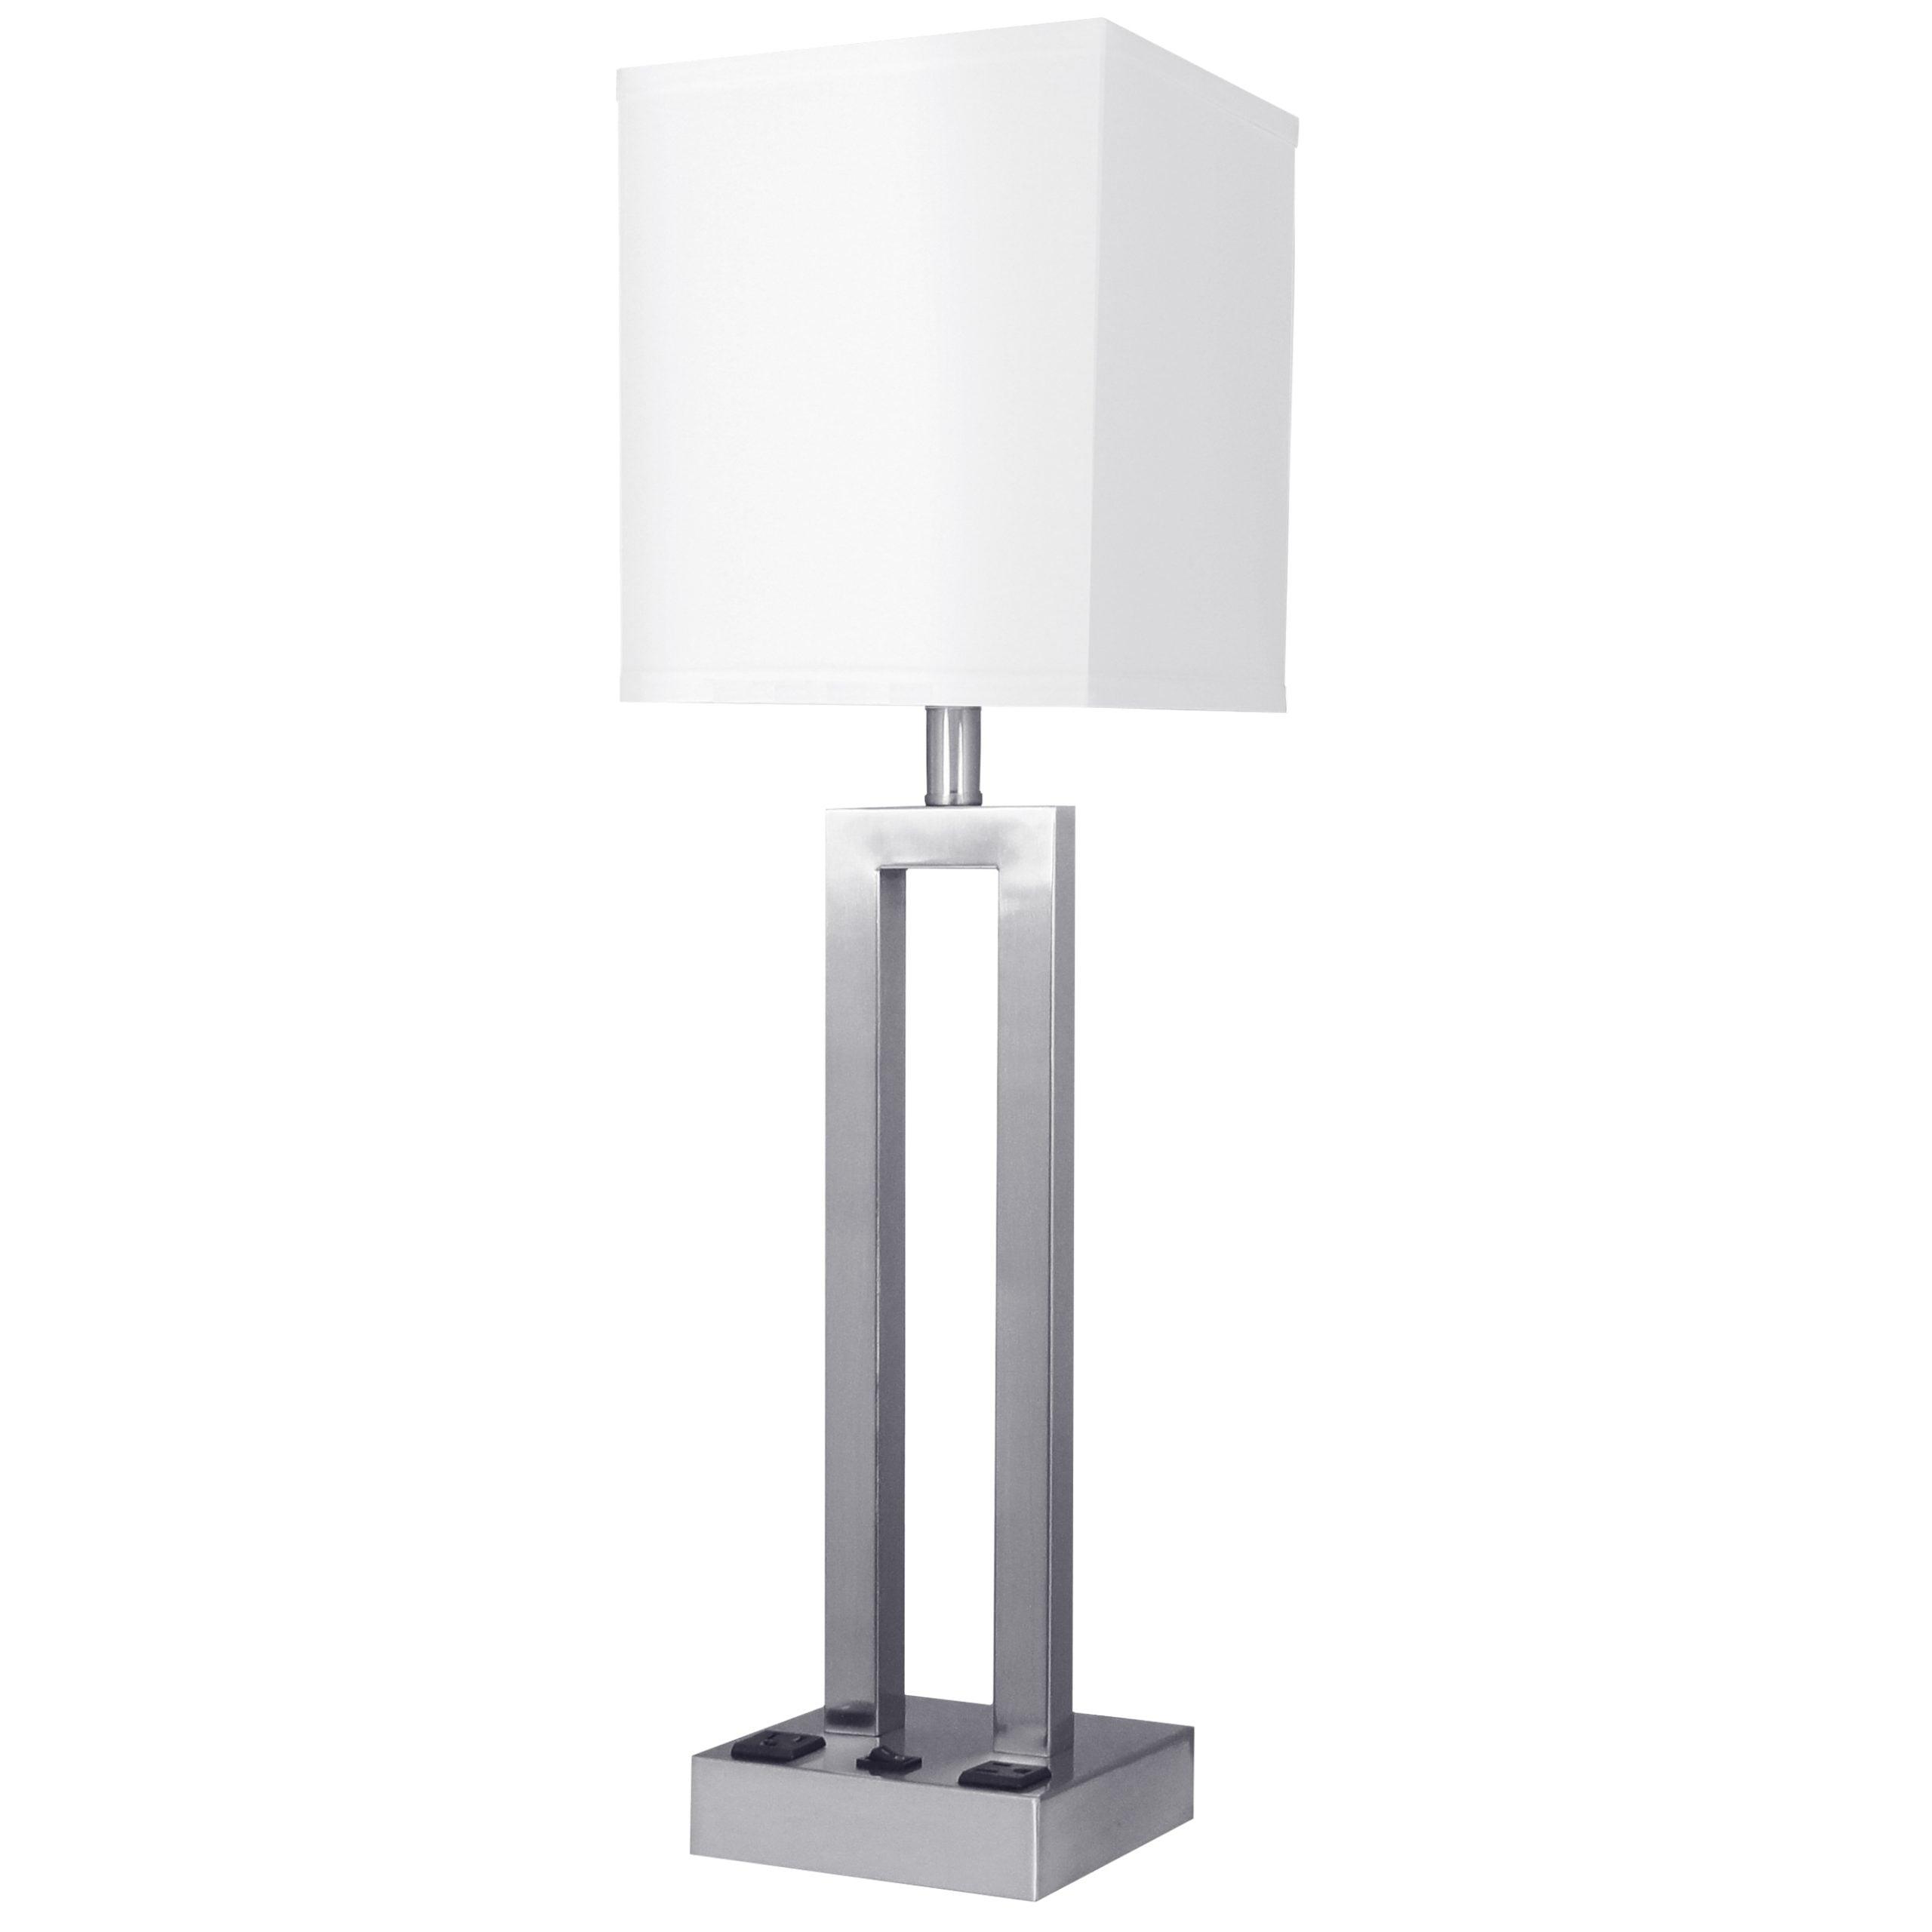 Decatur Single Table Lamp